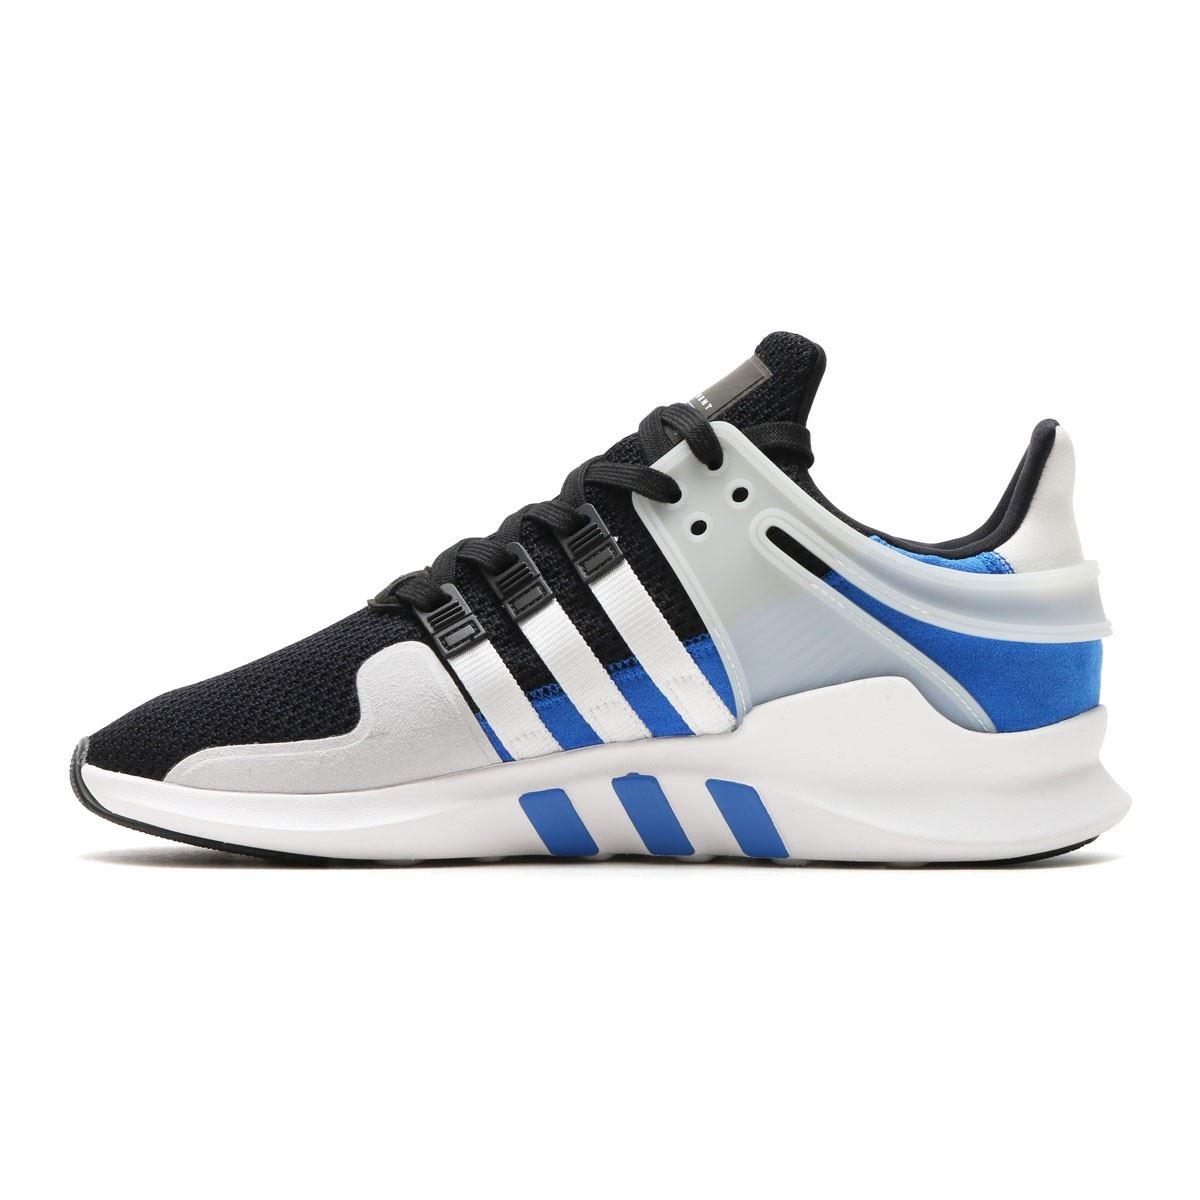 adidas-EQT-Support-ADV-Mens-Trainers-Originals-RRP-90-SAVE-039-S-MOST-SIZES miniatuur 9